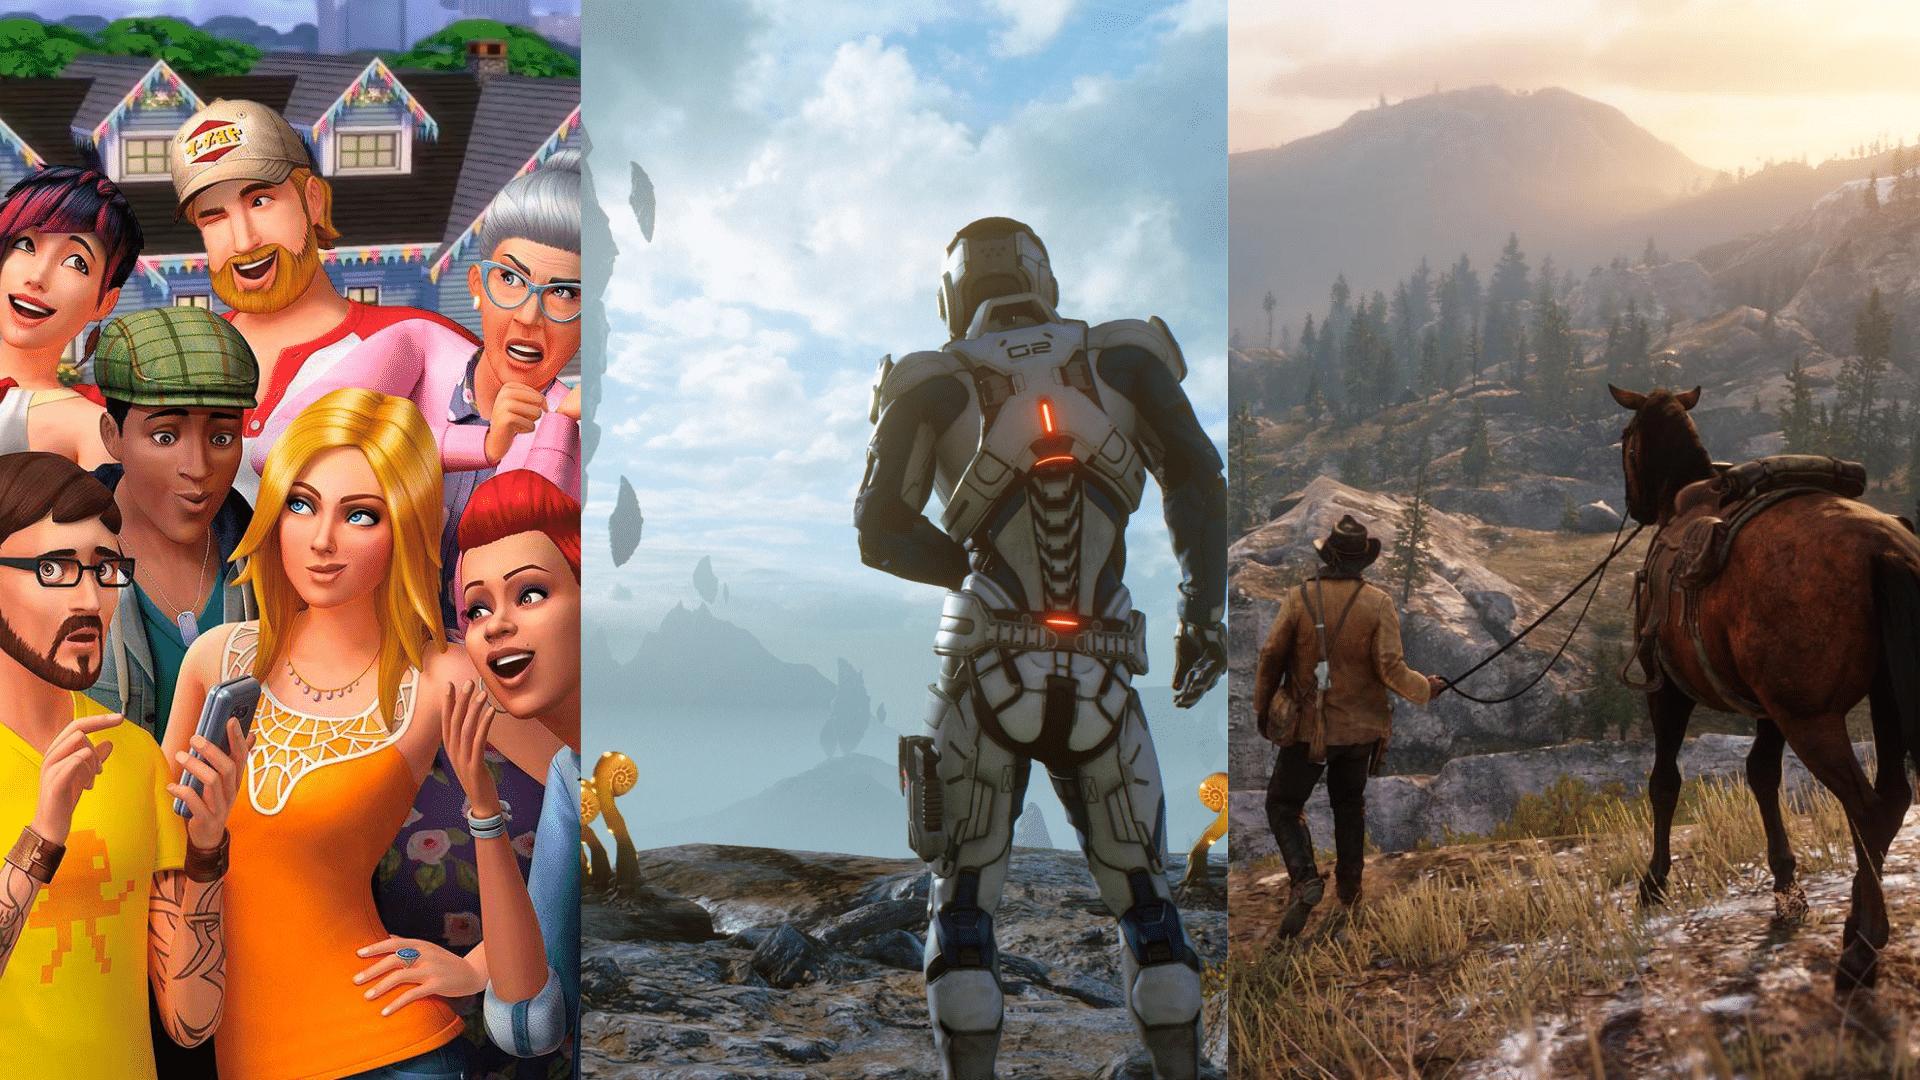 Morality & Gaming